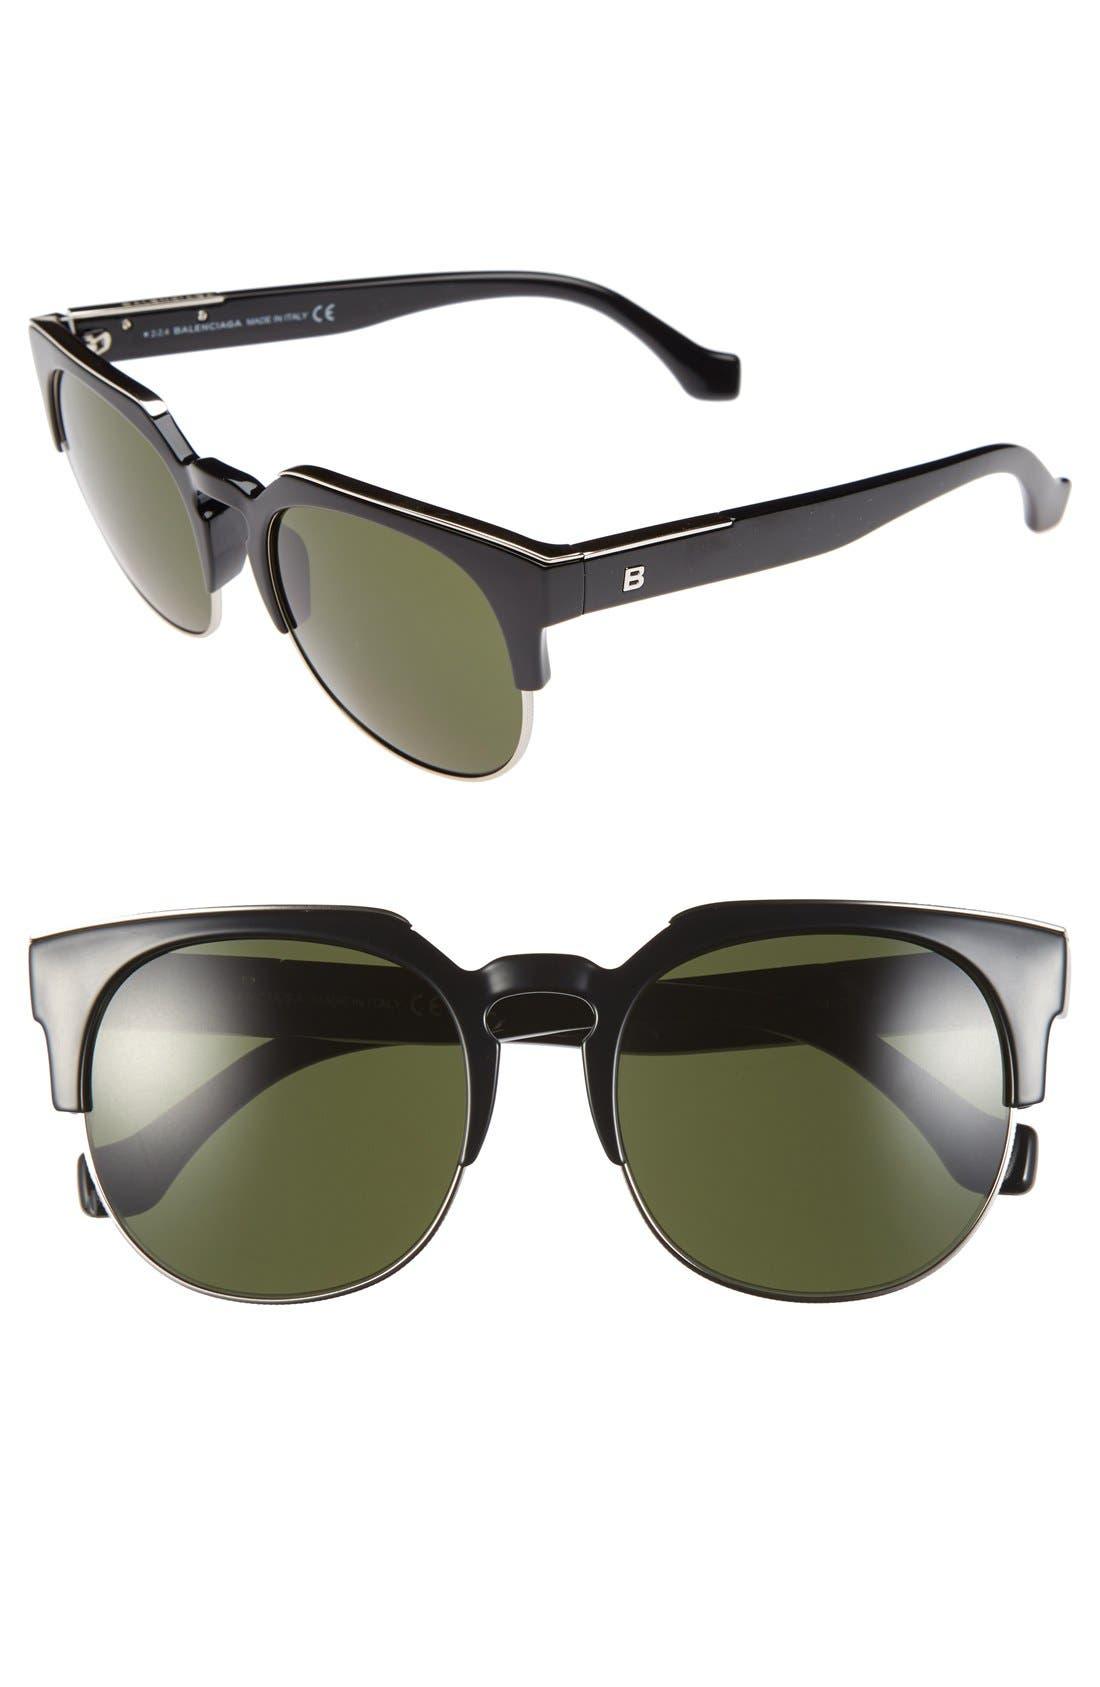 54mm Sunglasses,                         Main,                         color, Black/ Graident Smoke Lenses